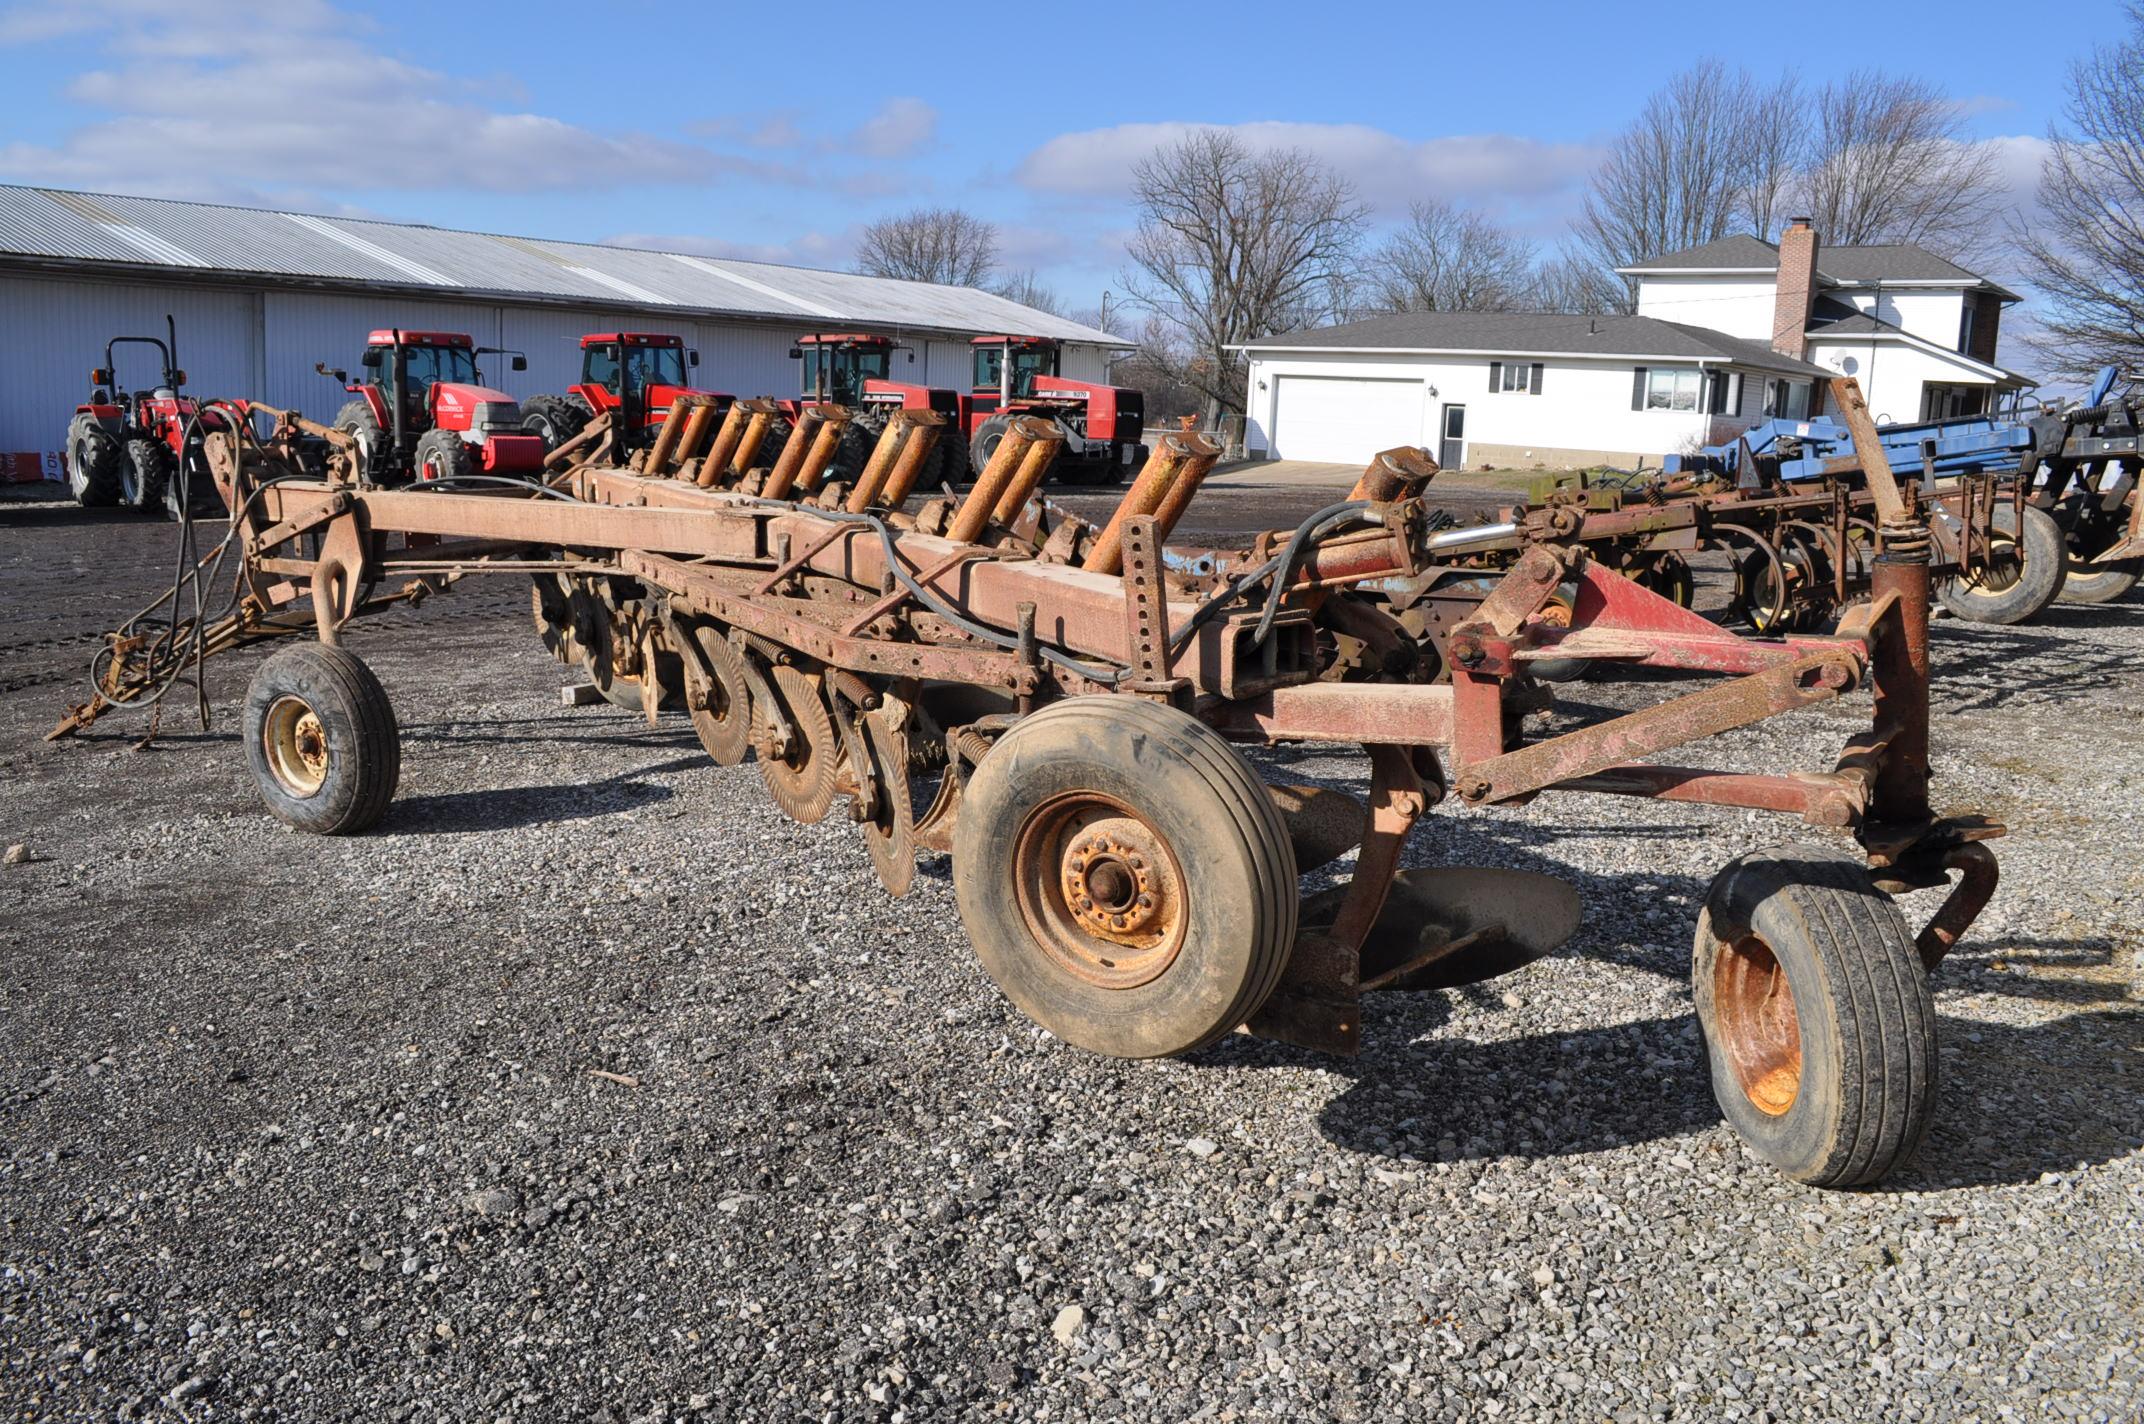 International 700 onland moldboard plow, 7 btm, auto reset trip - Image 4 of 16